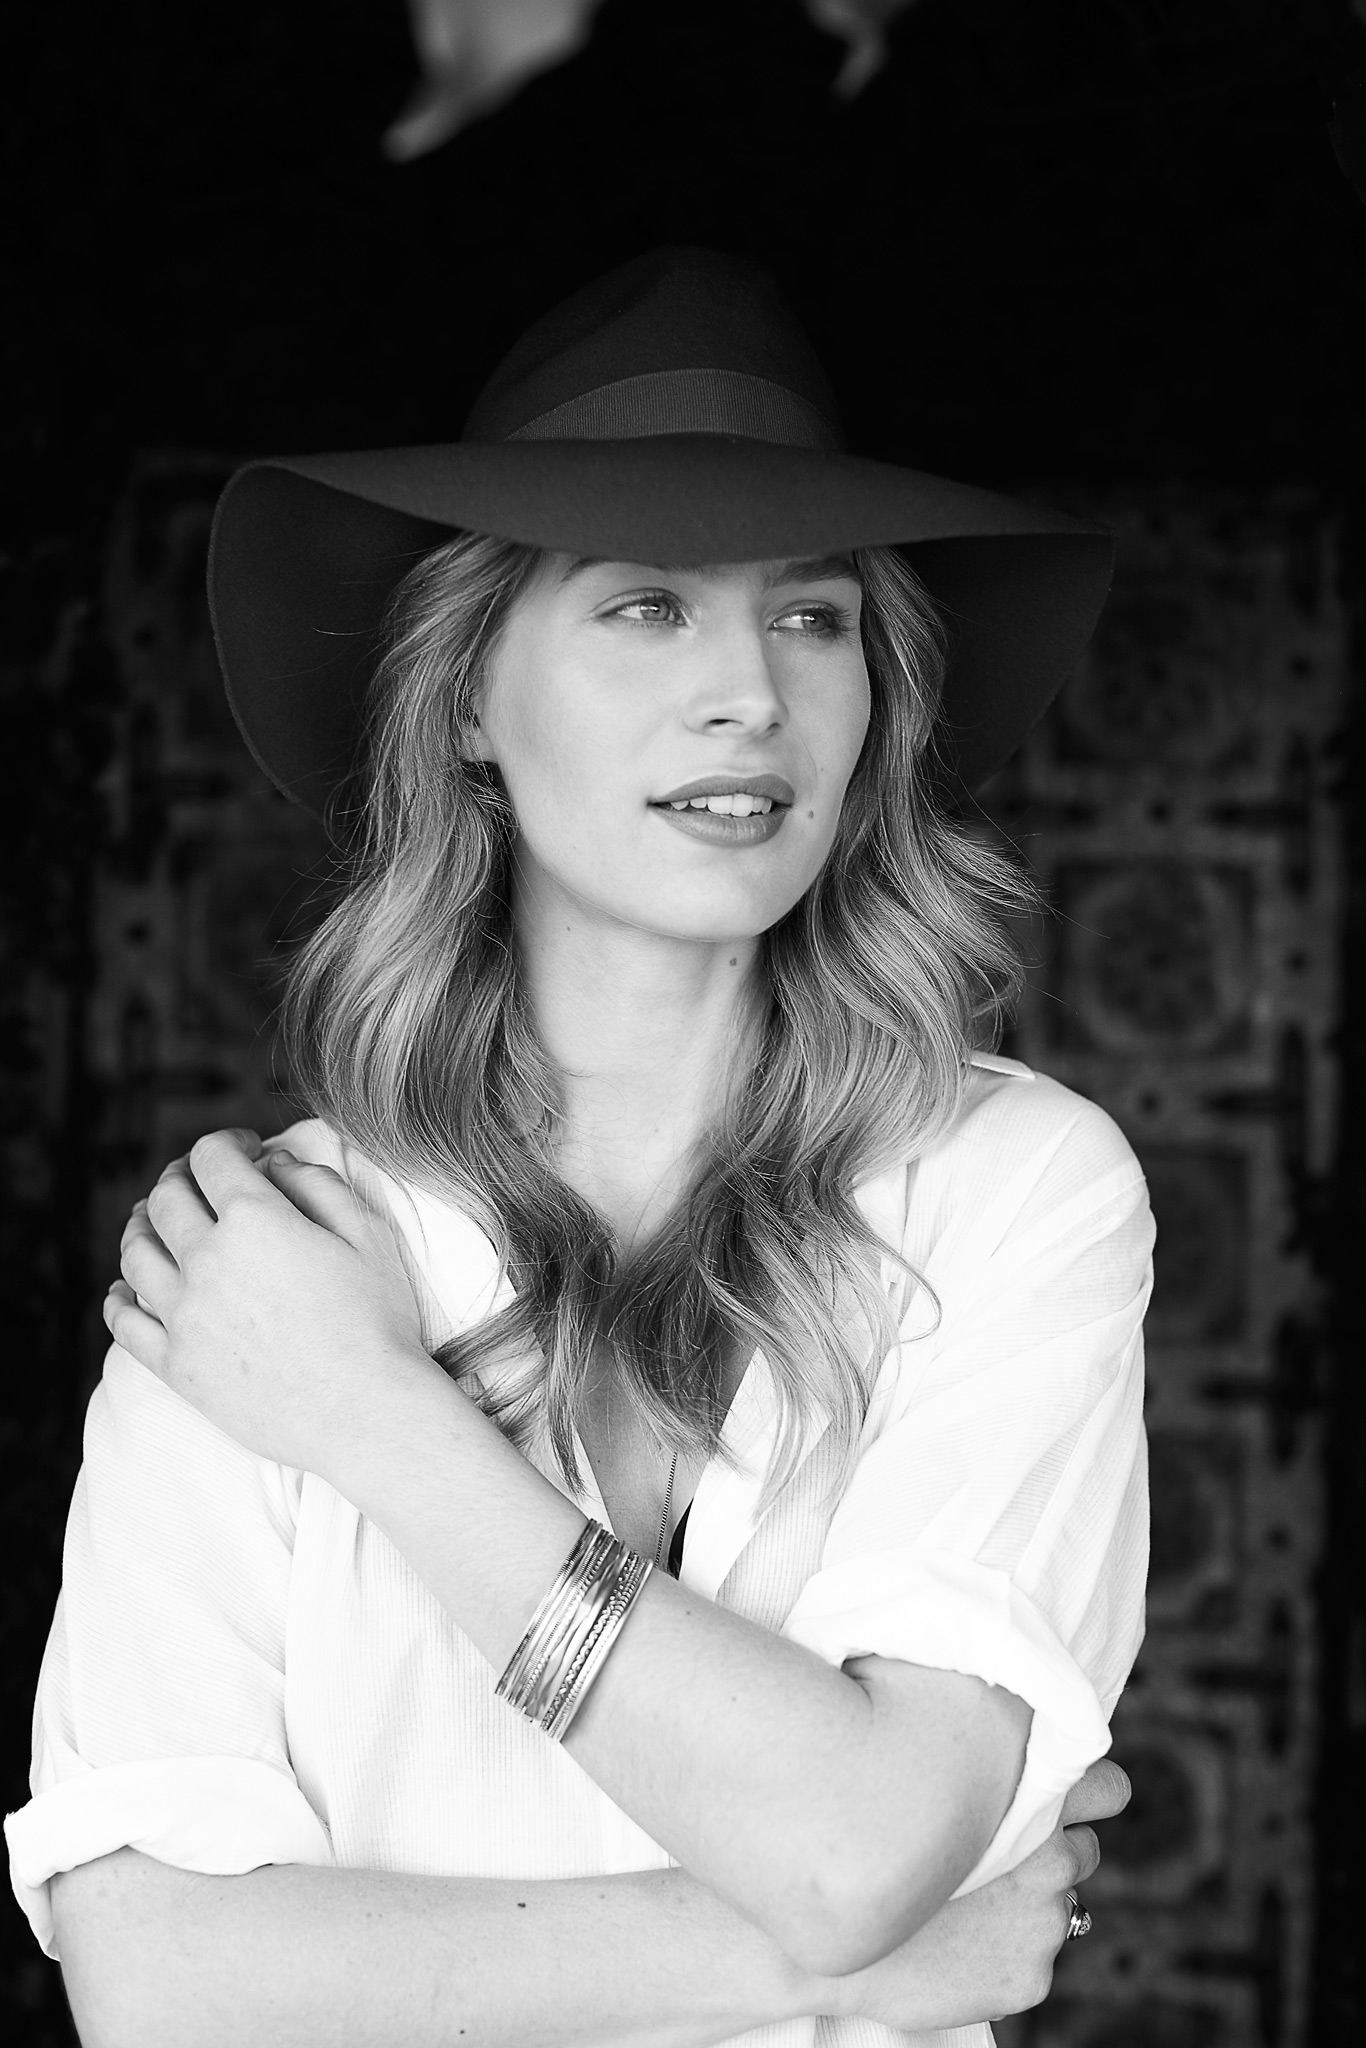 Jessica-Alexander-lifestyle-105.jpg